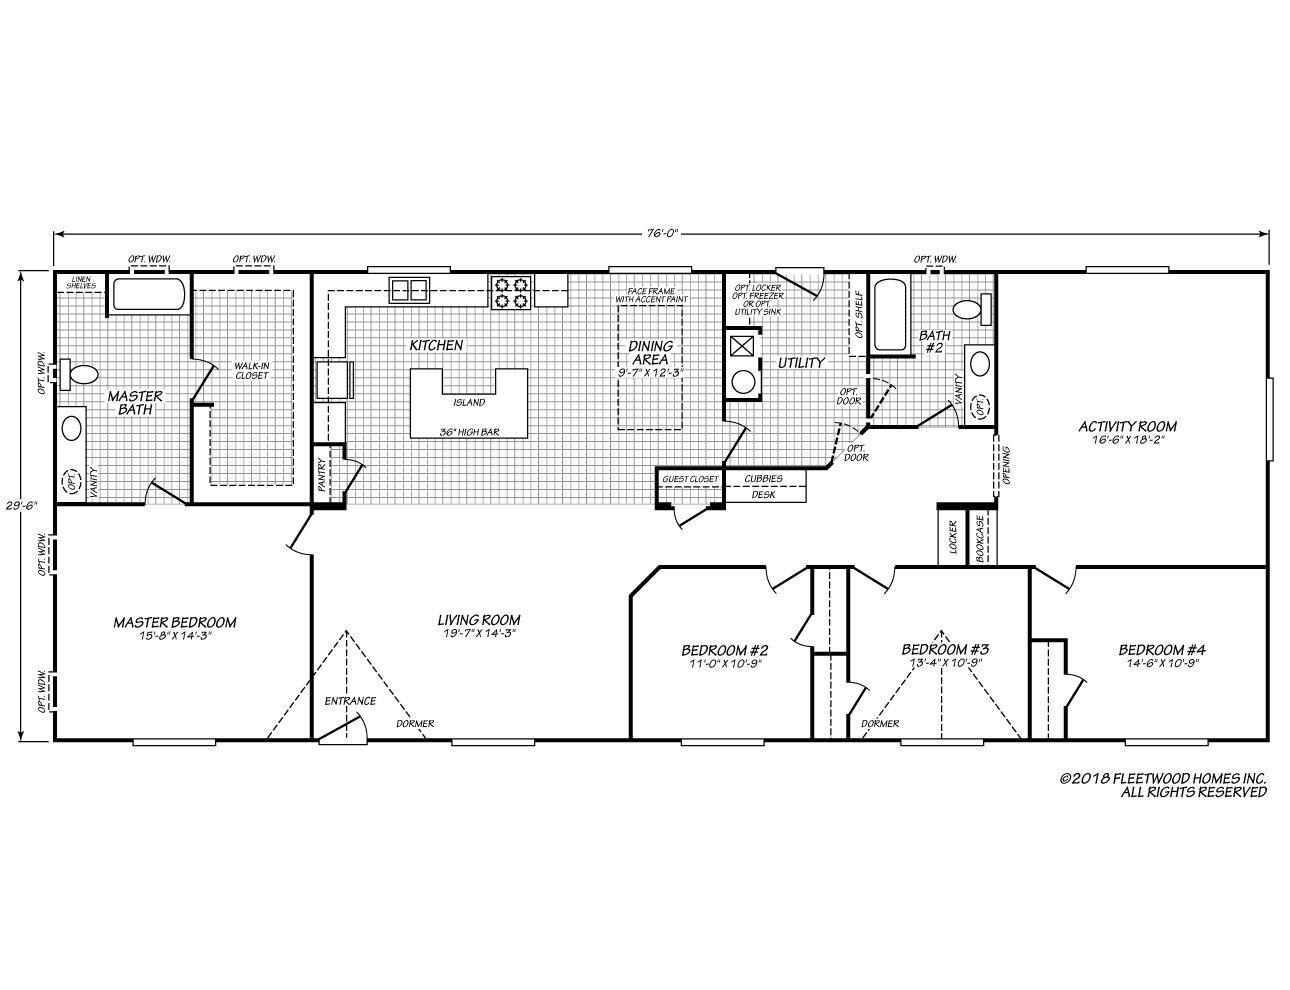 Fleetwood Homes Model WC 10W   Mobile home floor plans ...